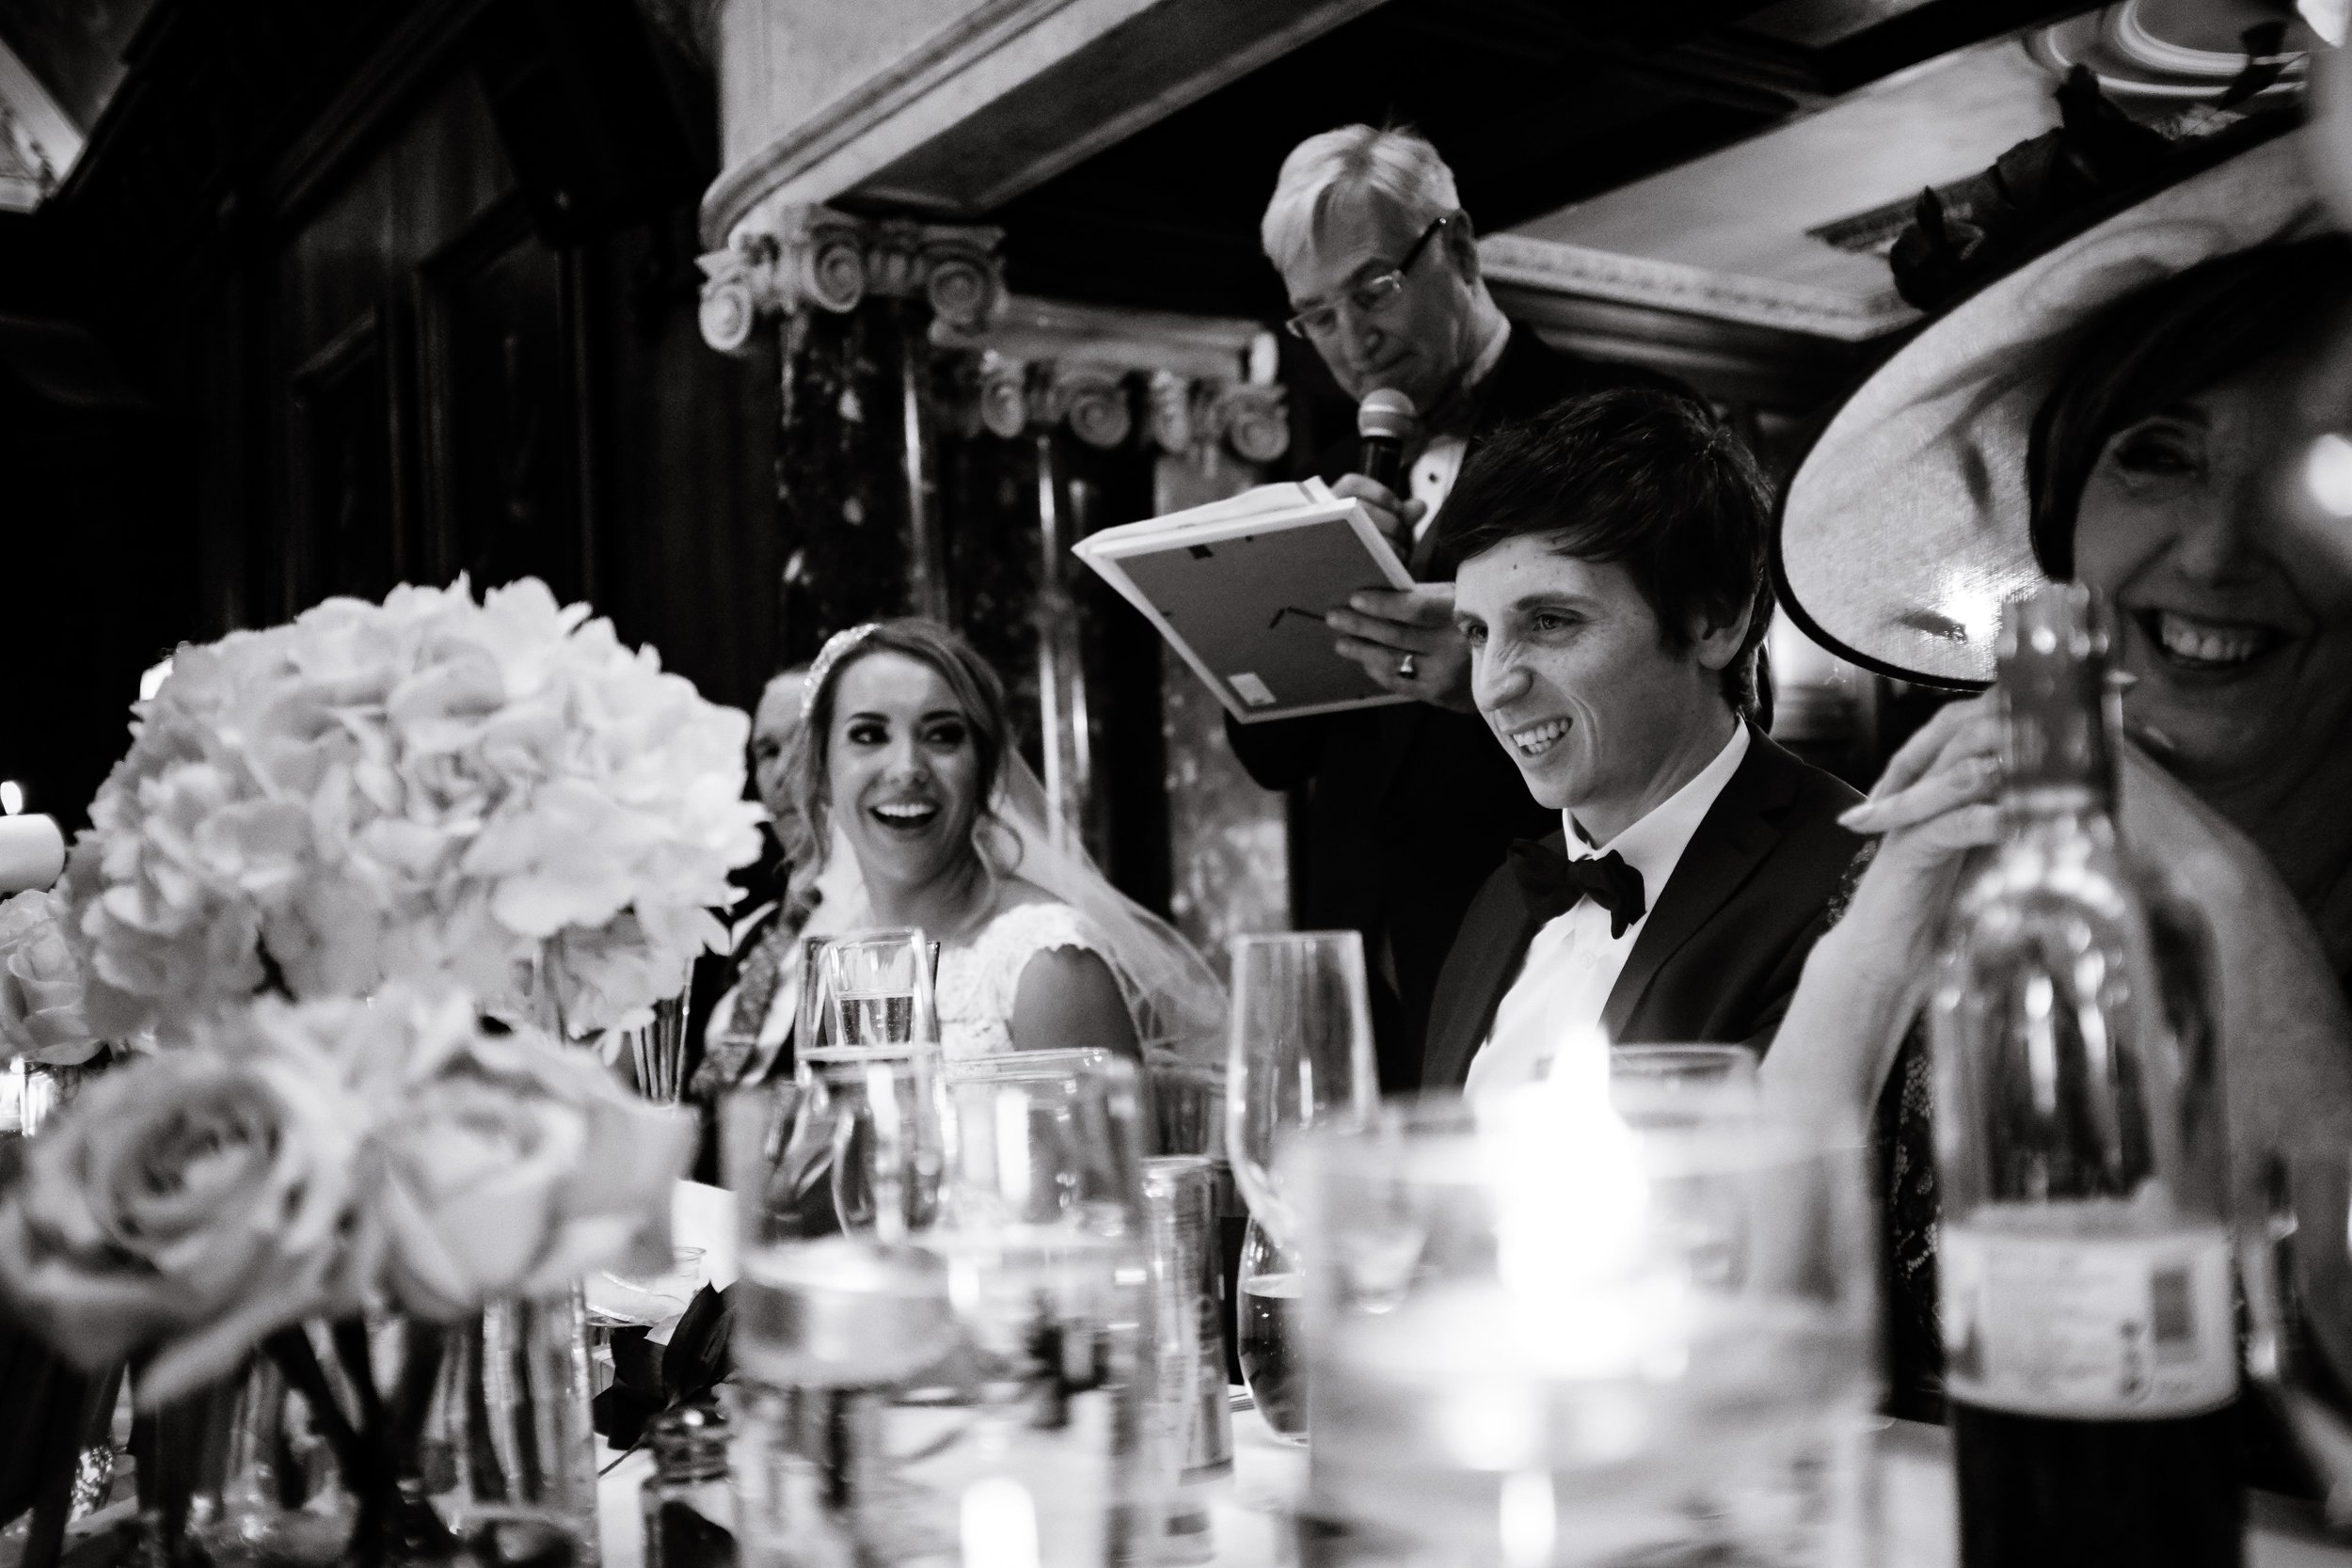 Thornton manor wedding photography cheshire wedding photographer liverpool manchester warrington chester wirral wedding BLOG (64 of 108).jpg